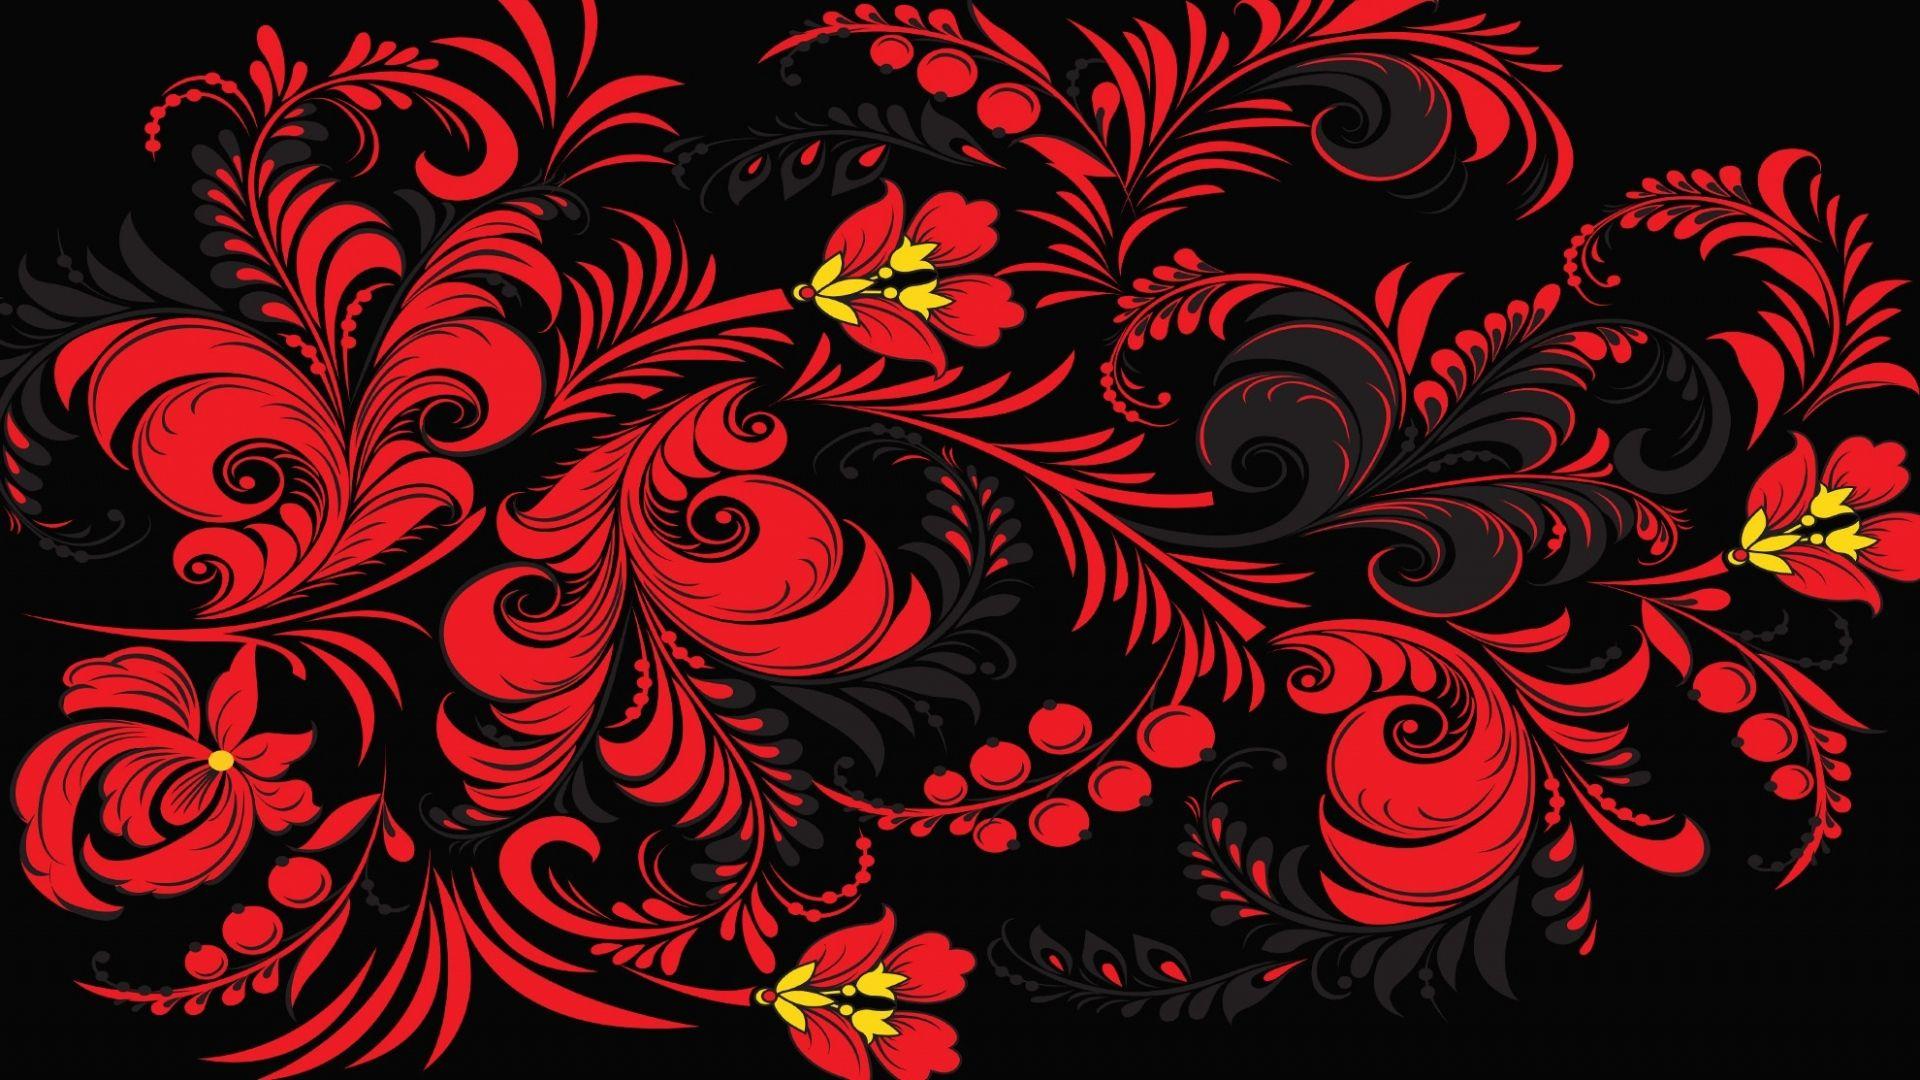 Wild textures free high resolution textures backgrounds and - Free High Resolution Textures And Backgrounds Wild Textures